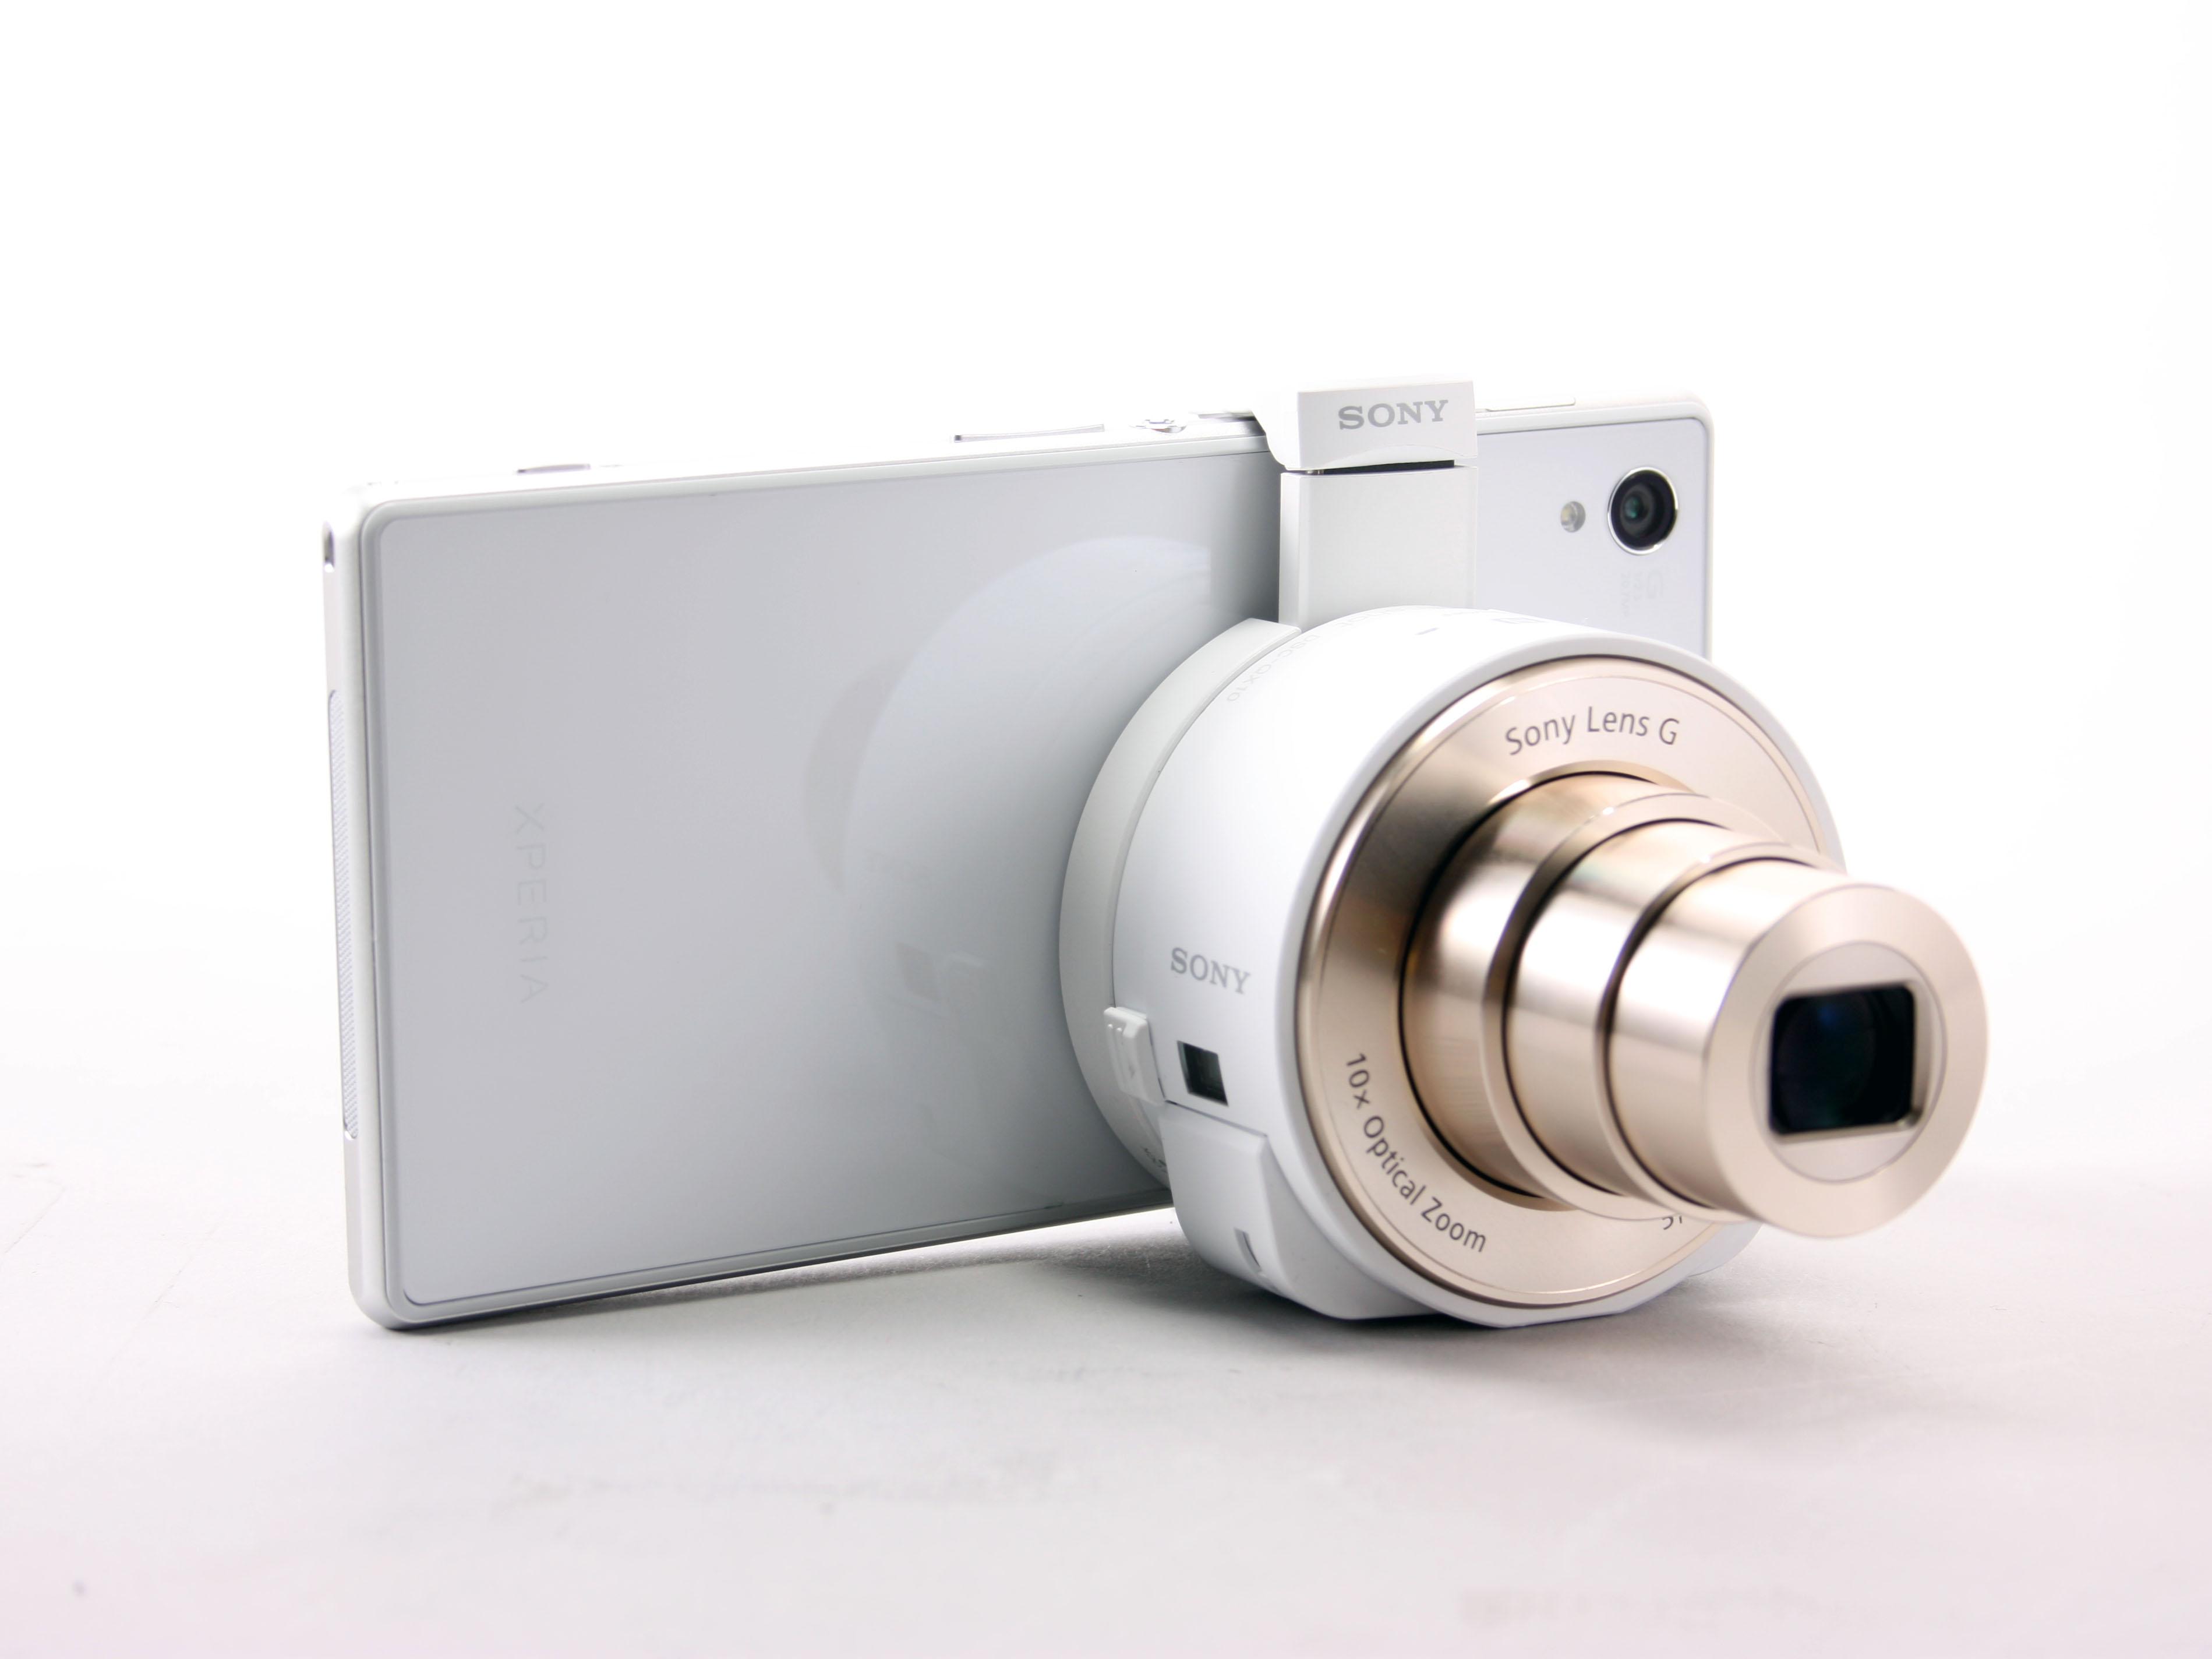 Sony DSC-QX 10 評測:手機外掛相機,手機拍照水準大提昇